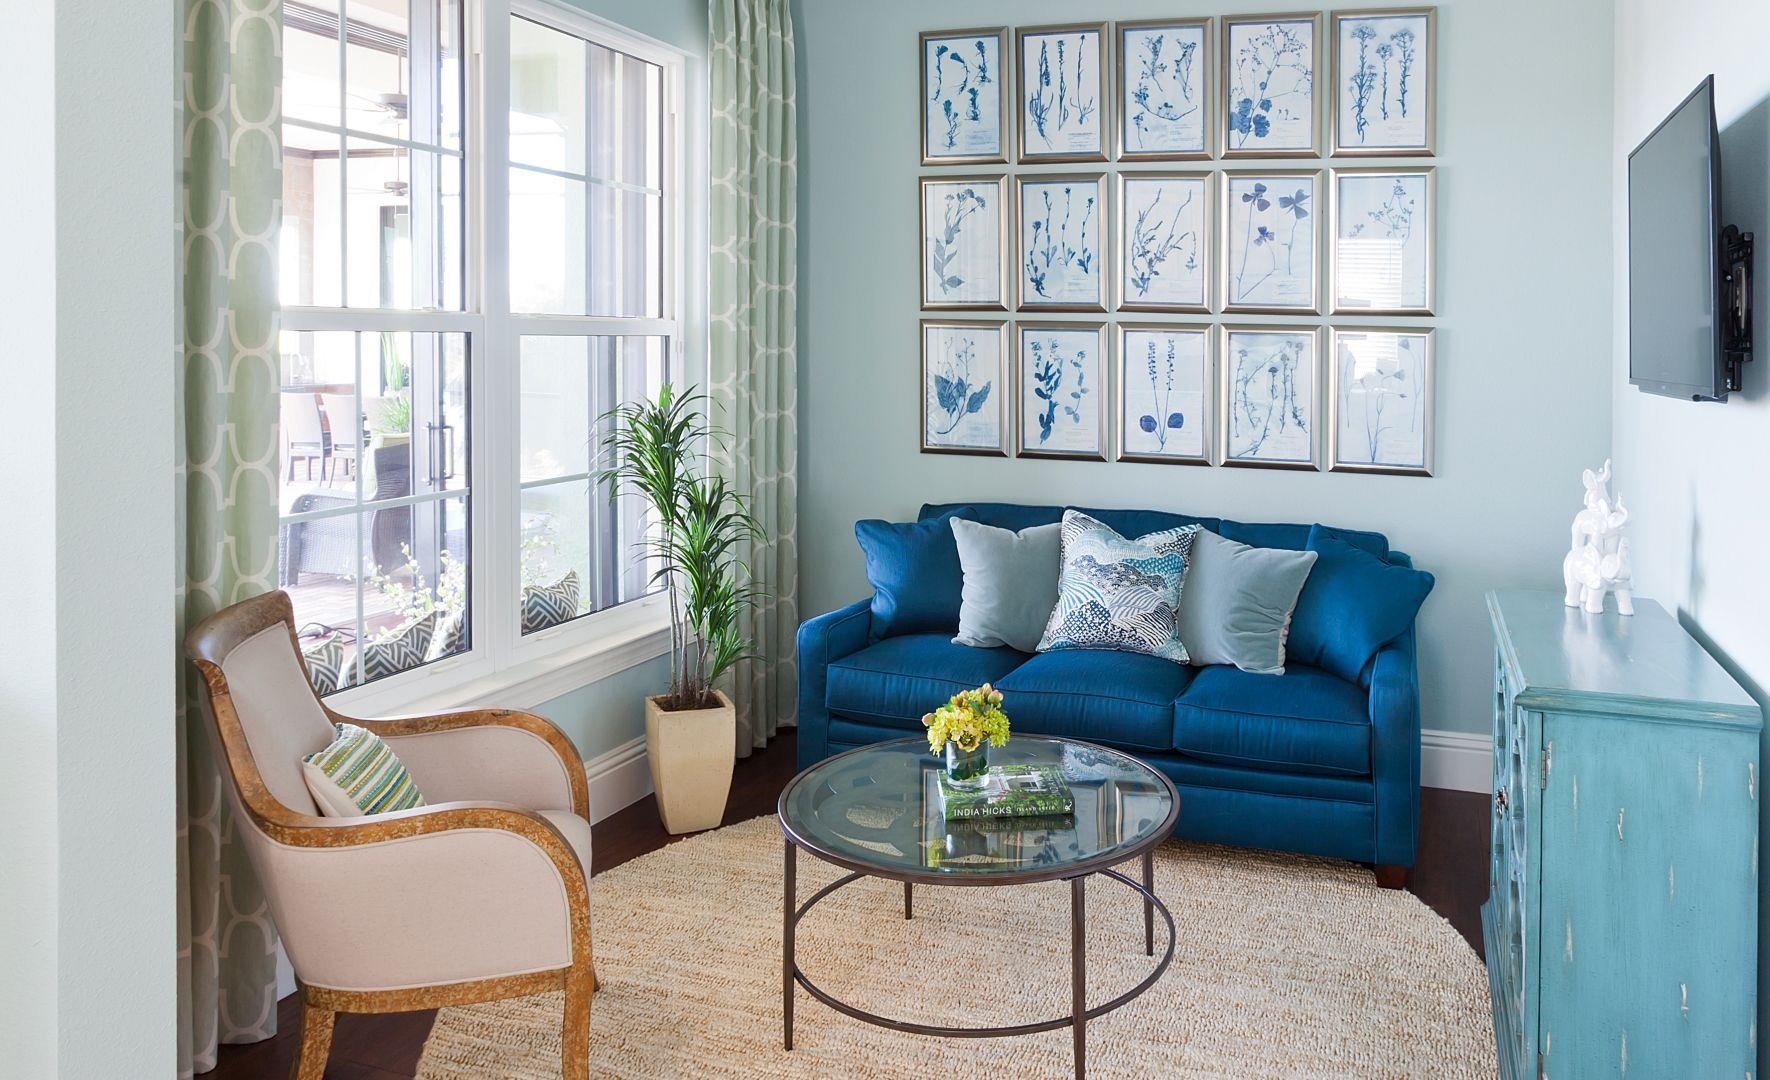 Master bedroom sitting area ideas by Beasley & Henley Interior Design.